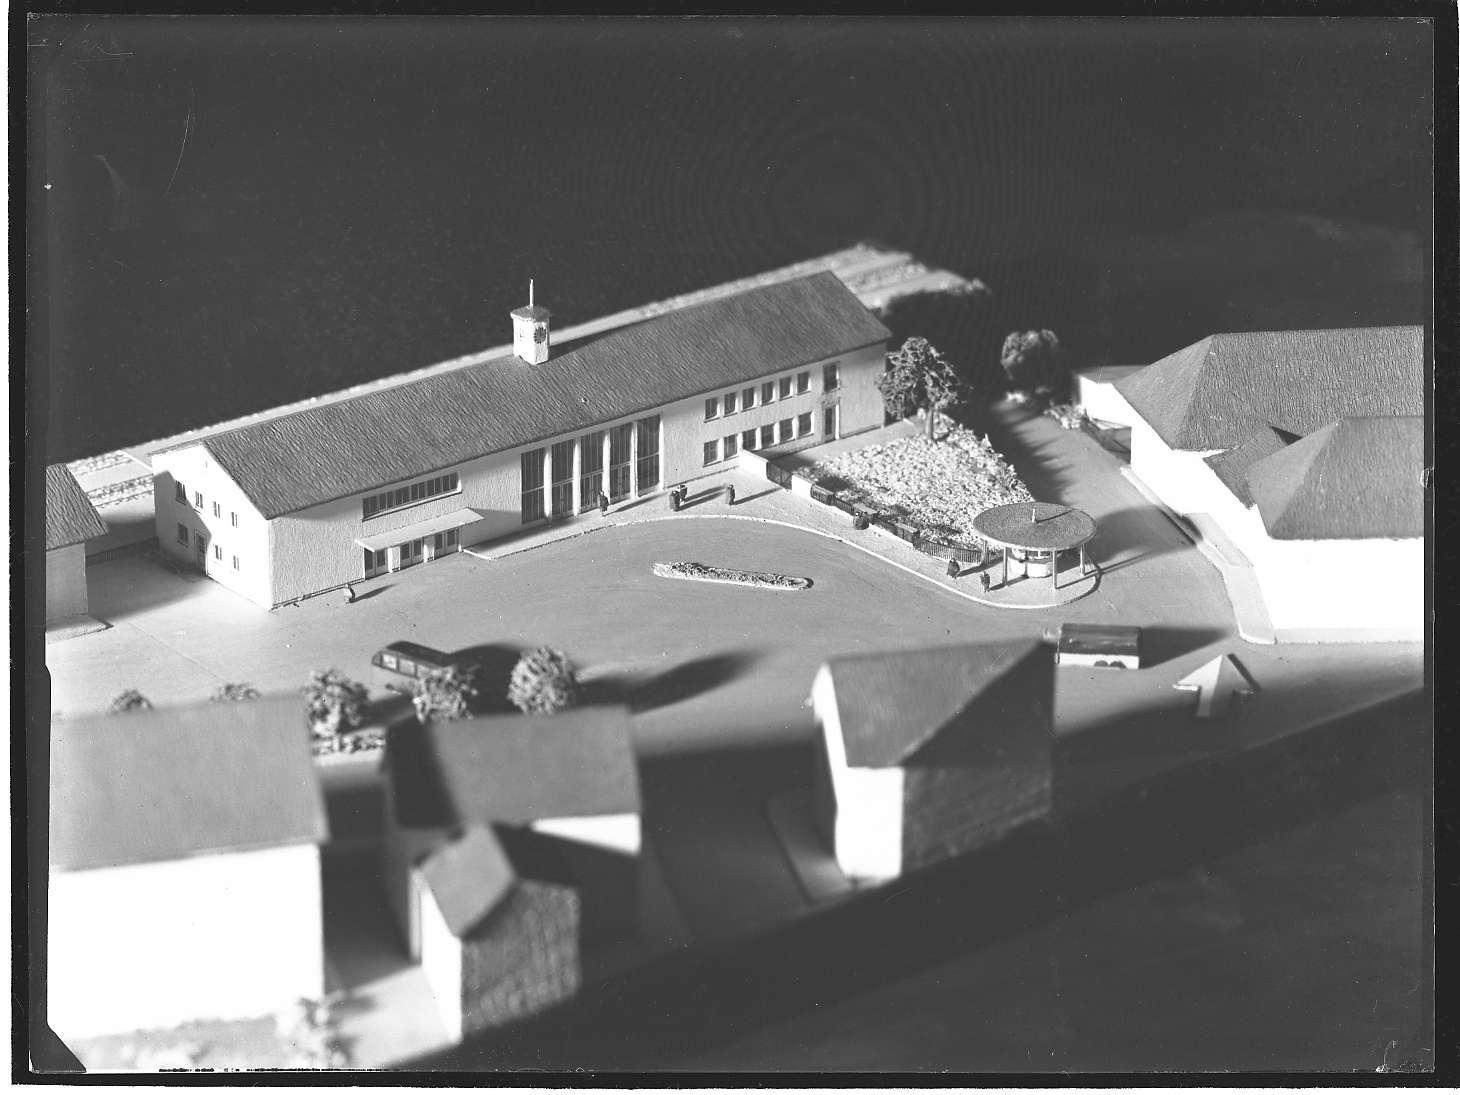 Lauffen am Neckar, Bf, Empfangsgebäude, Architekturmodell, Bild 1